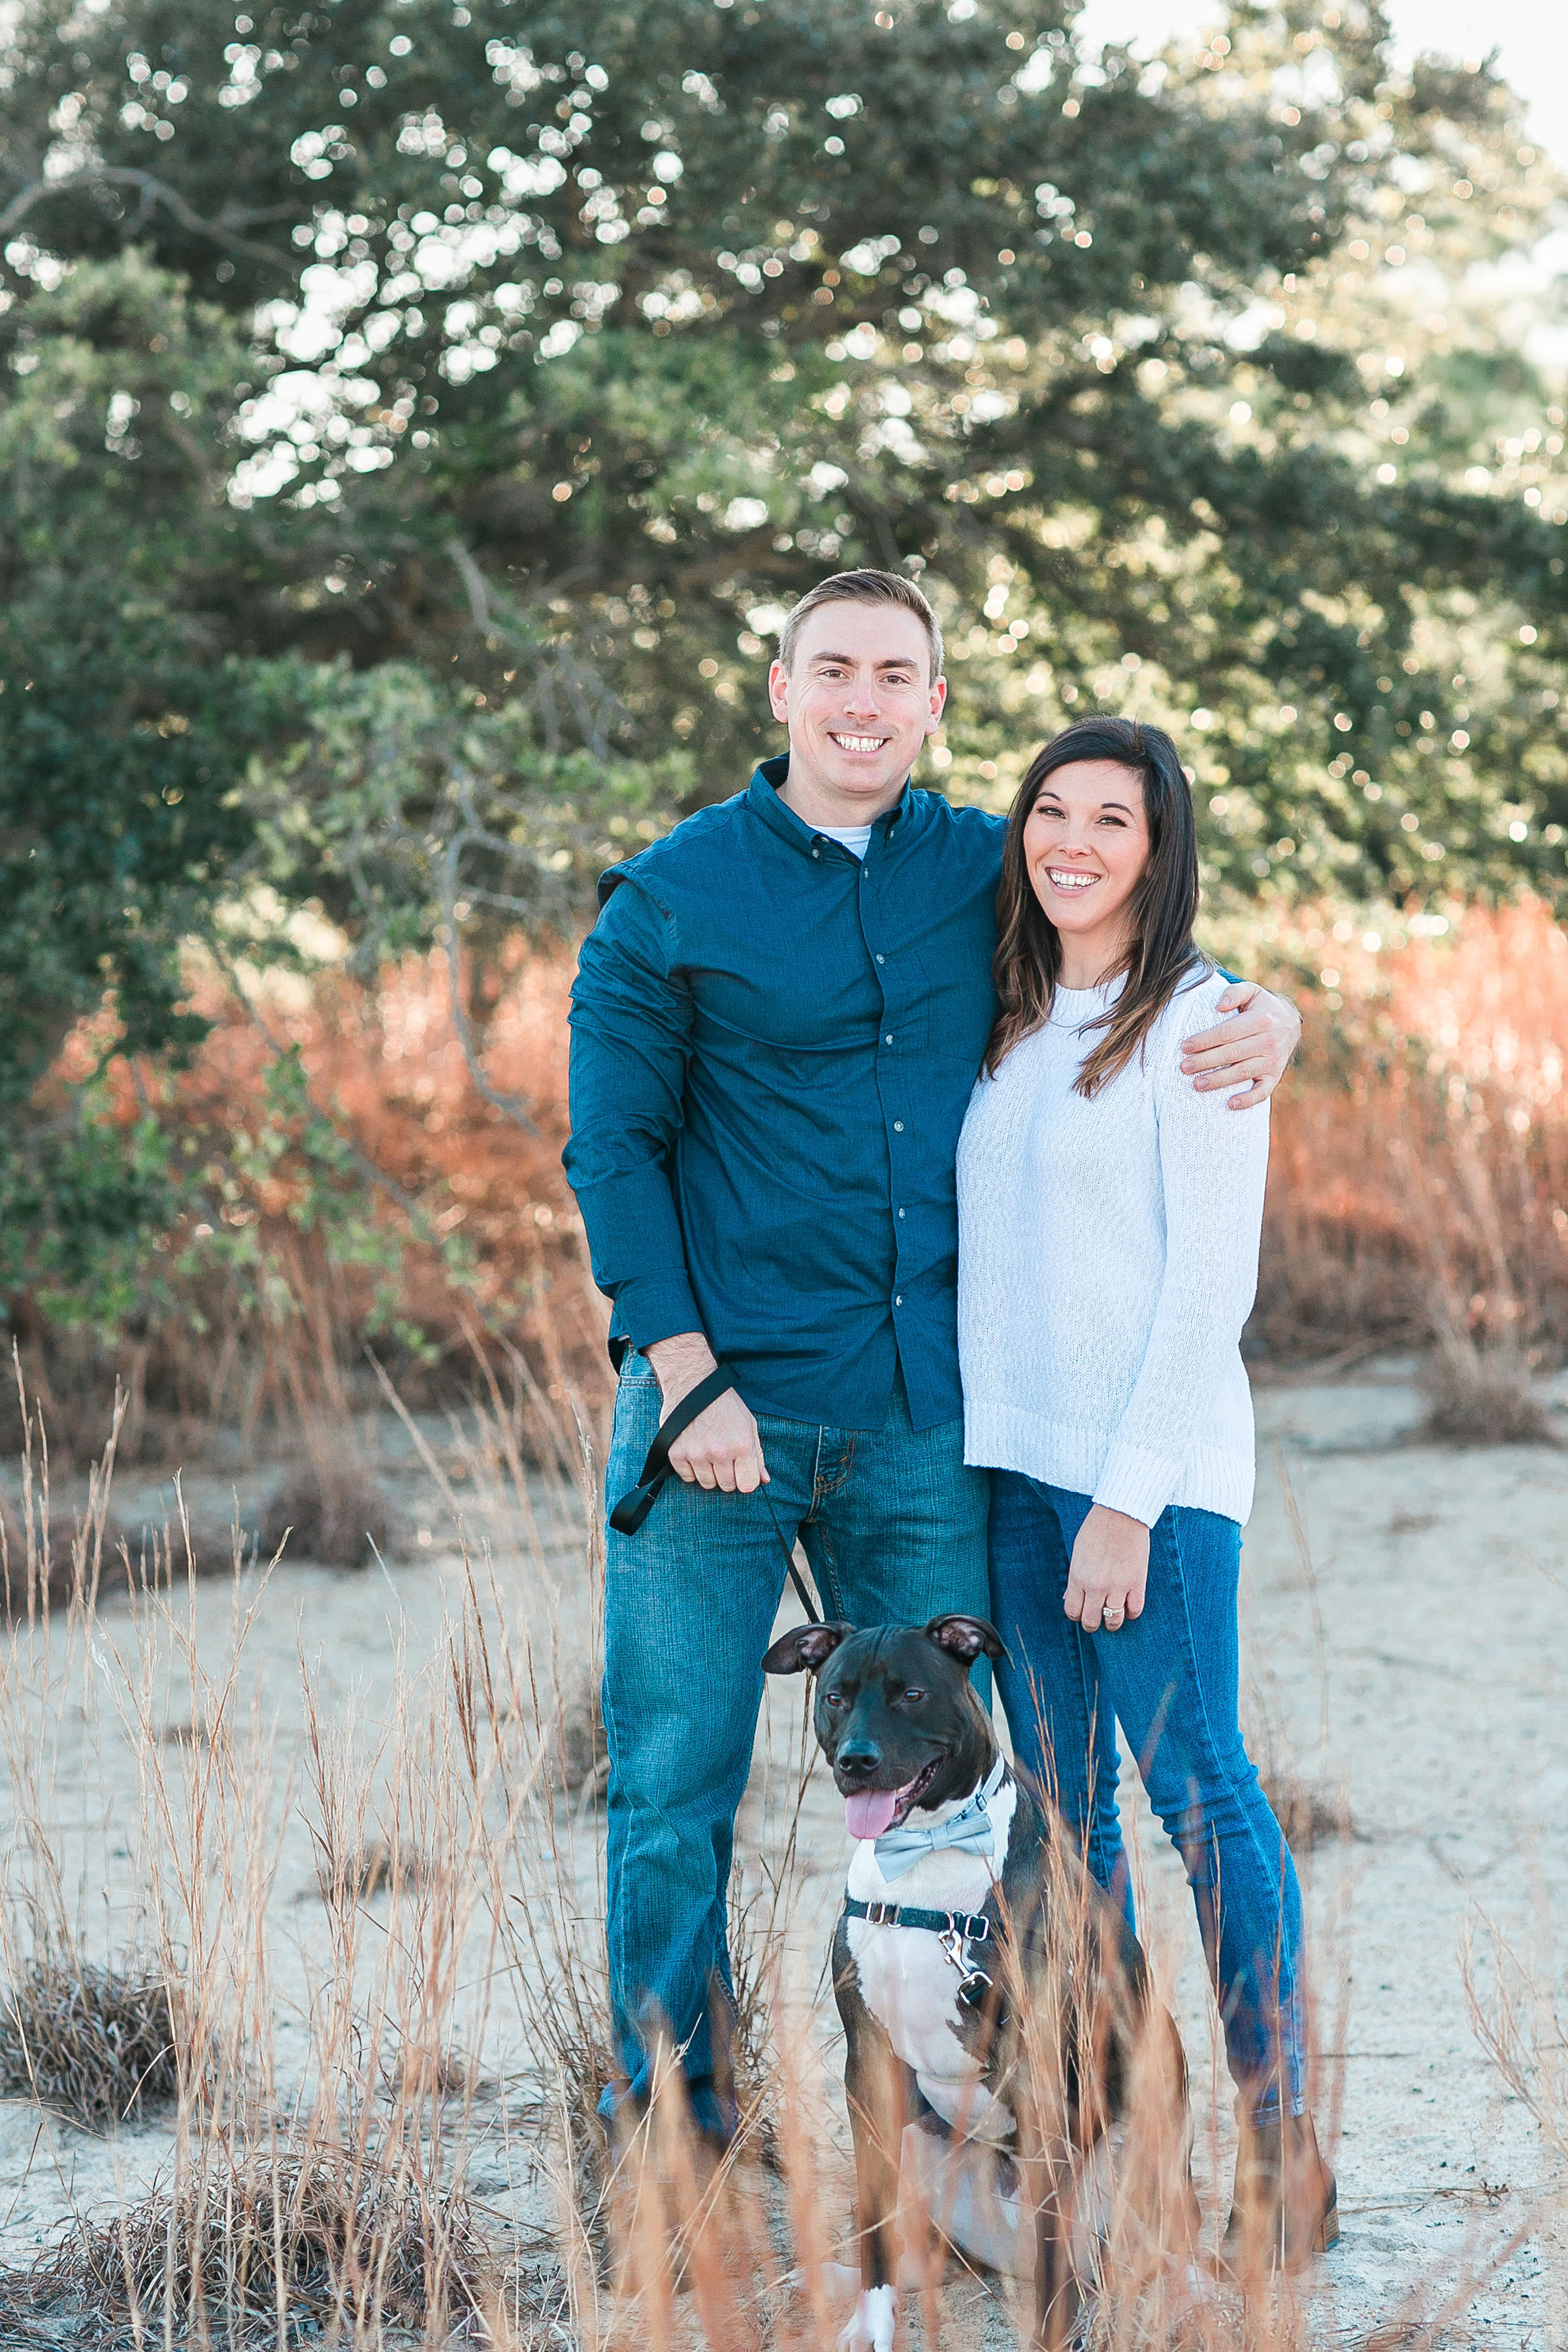 Nicole&Dustin_Engaged-2.jpg